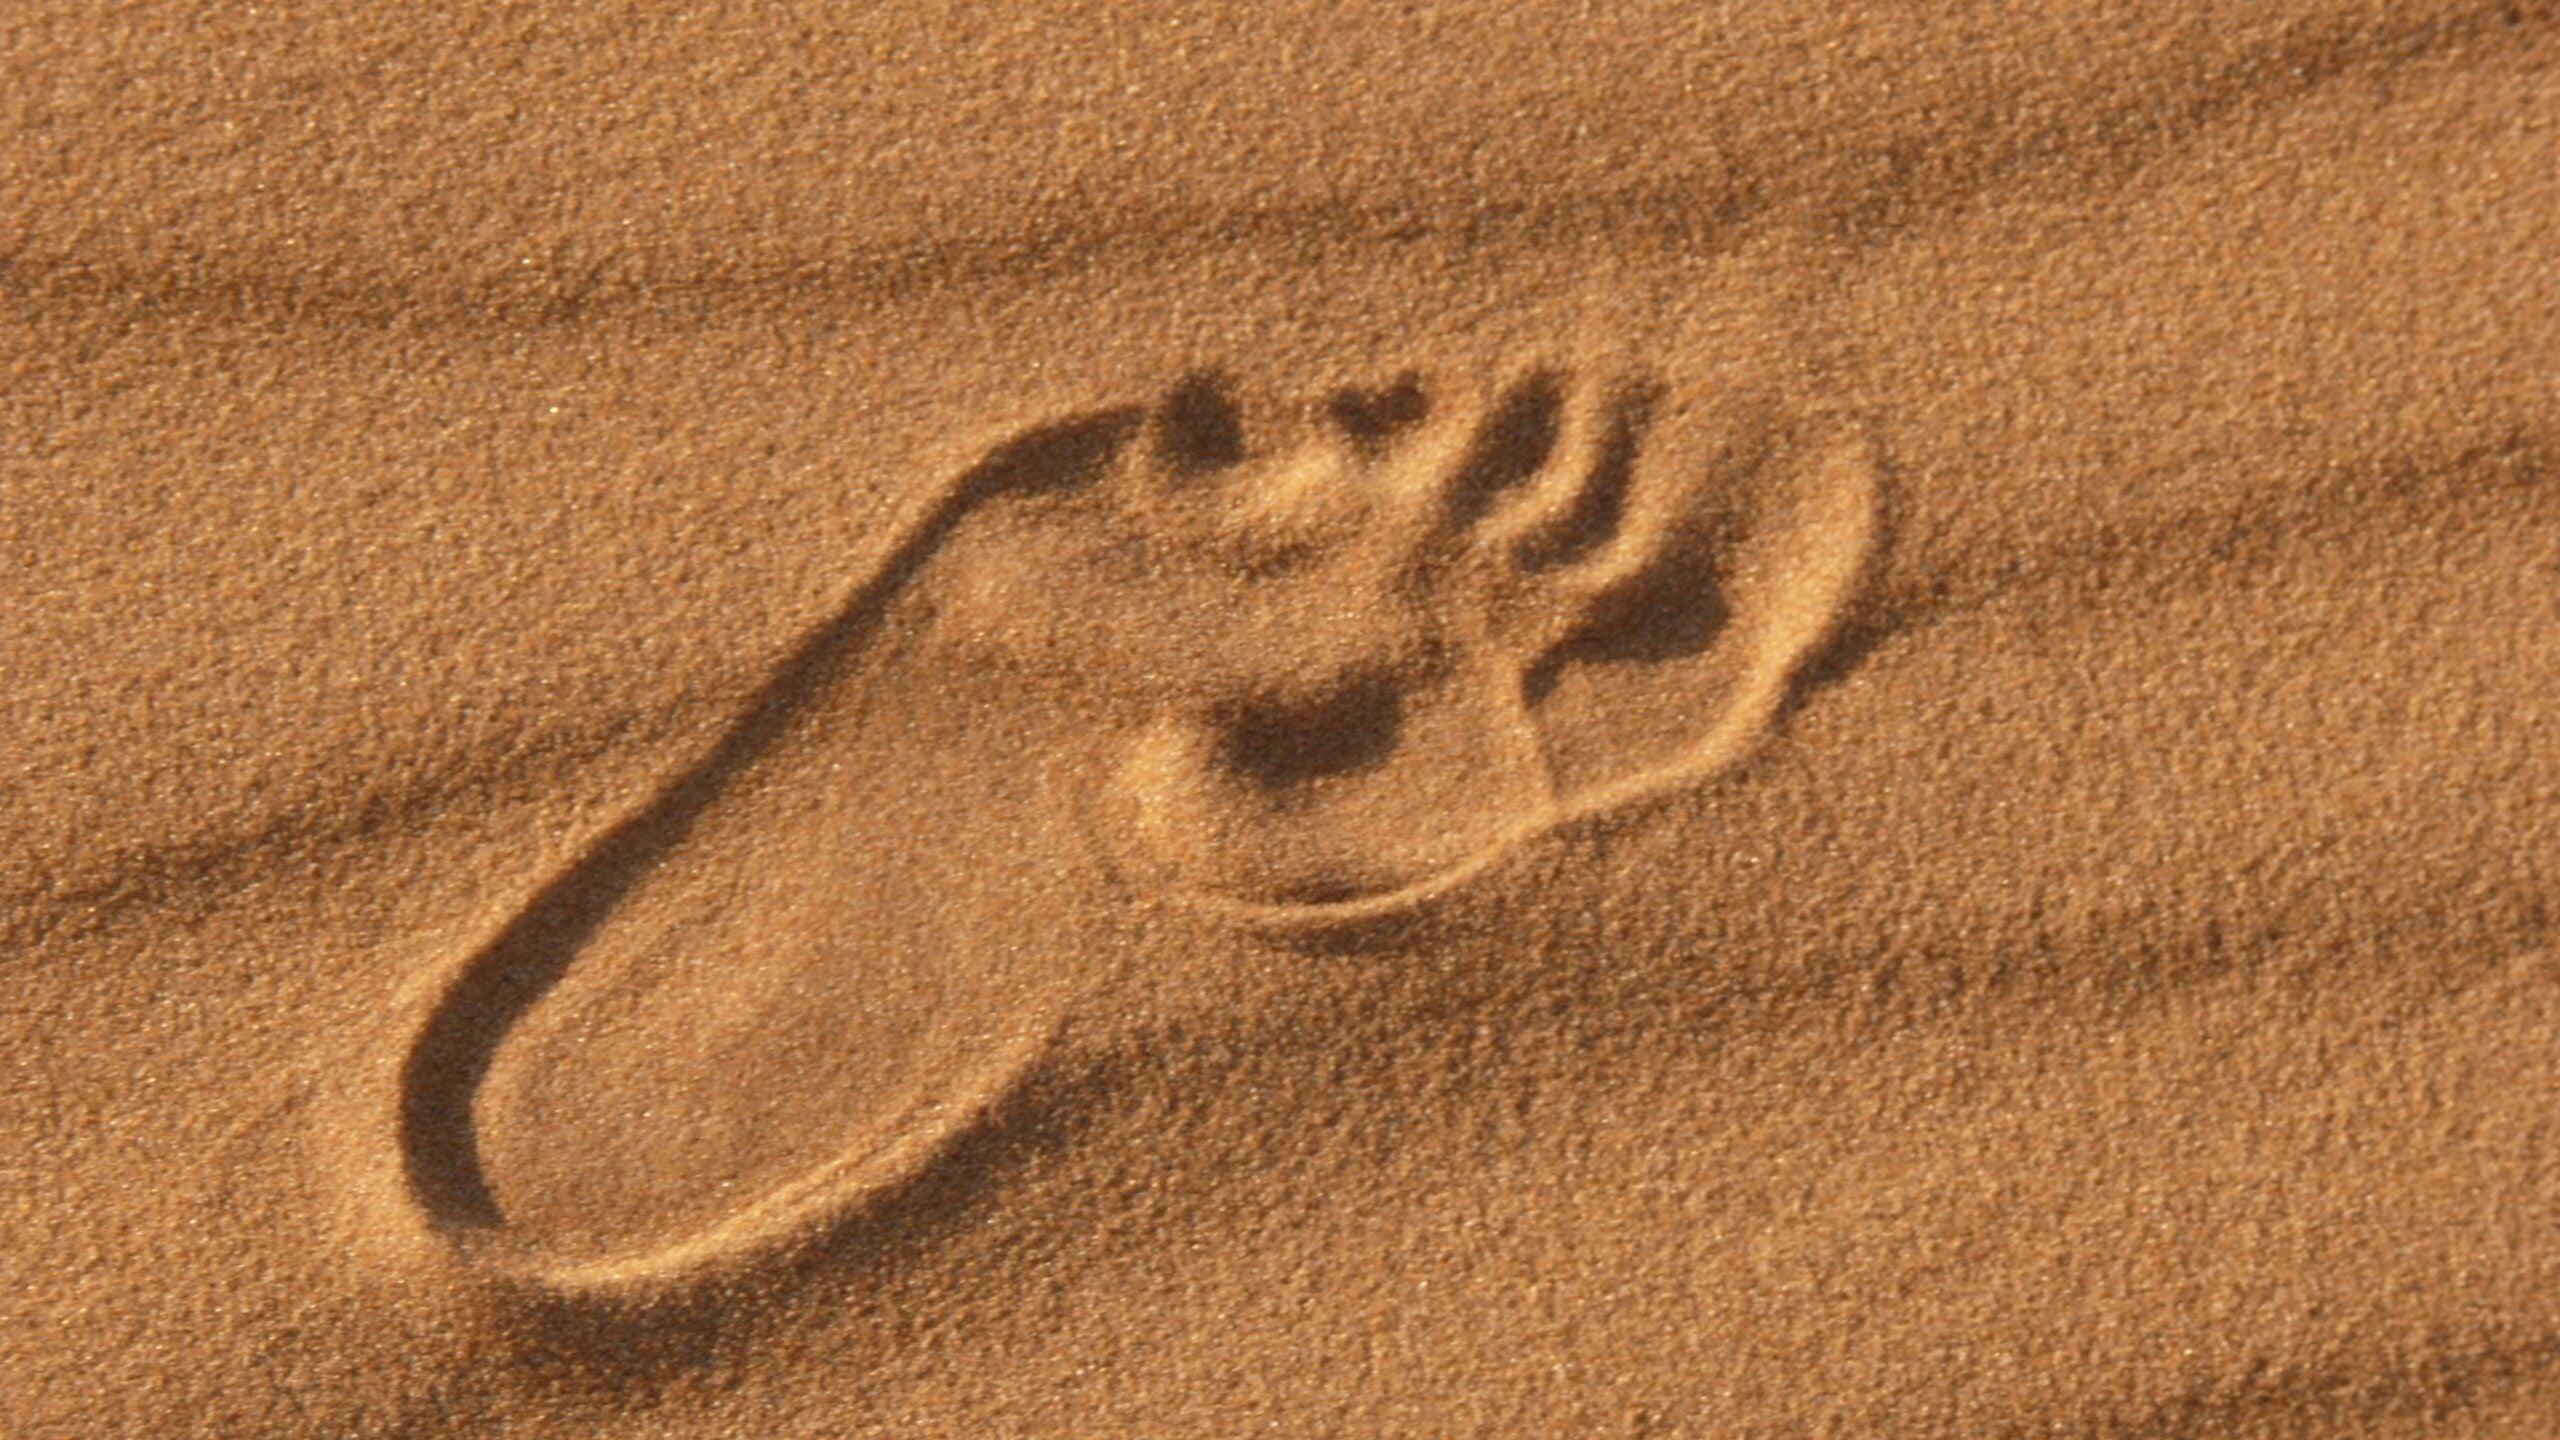 footprint in desert sand